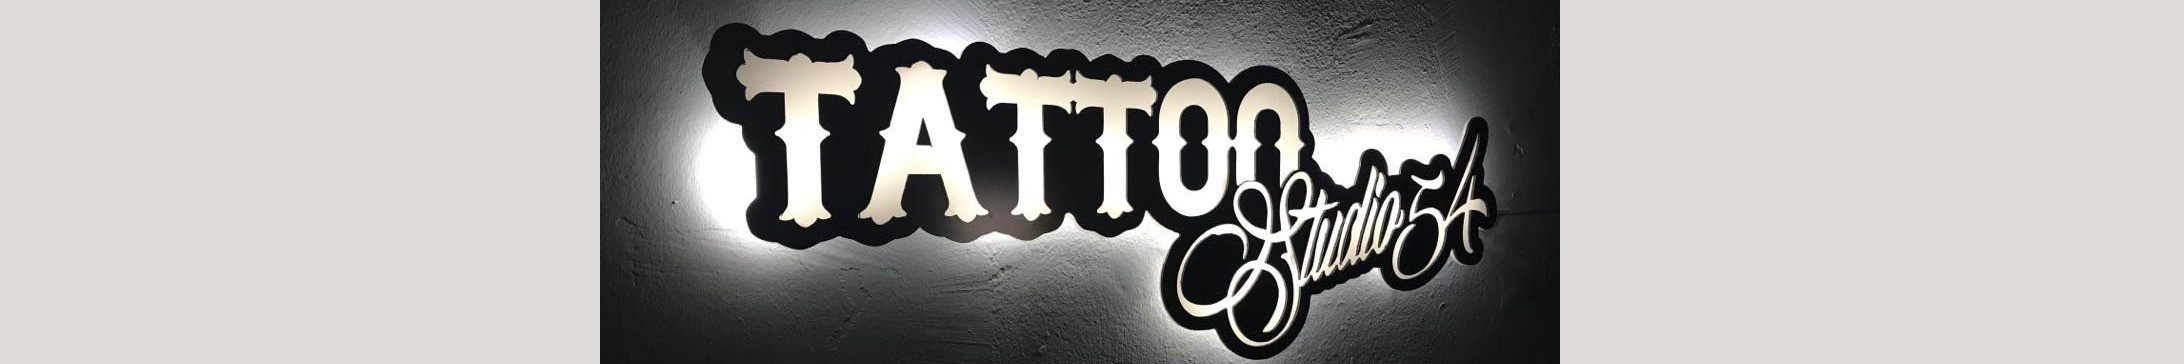 Tattoos Studio54